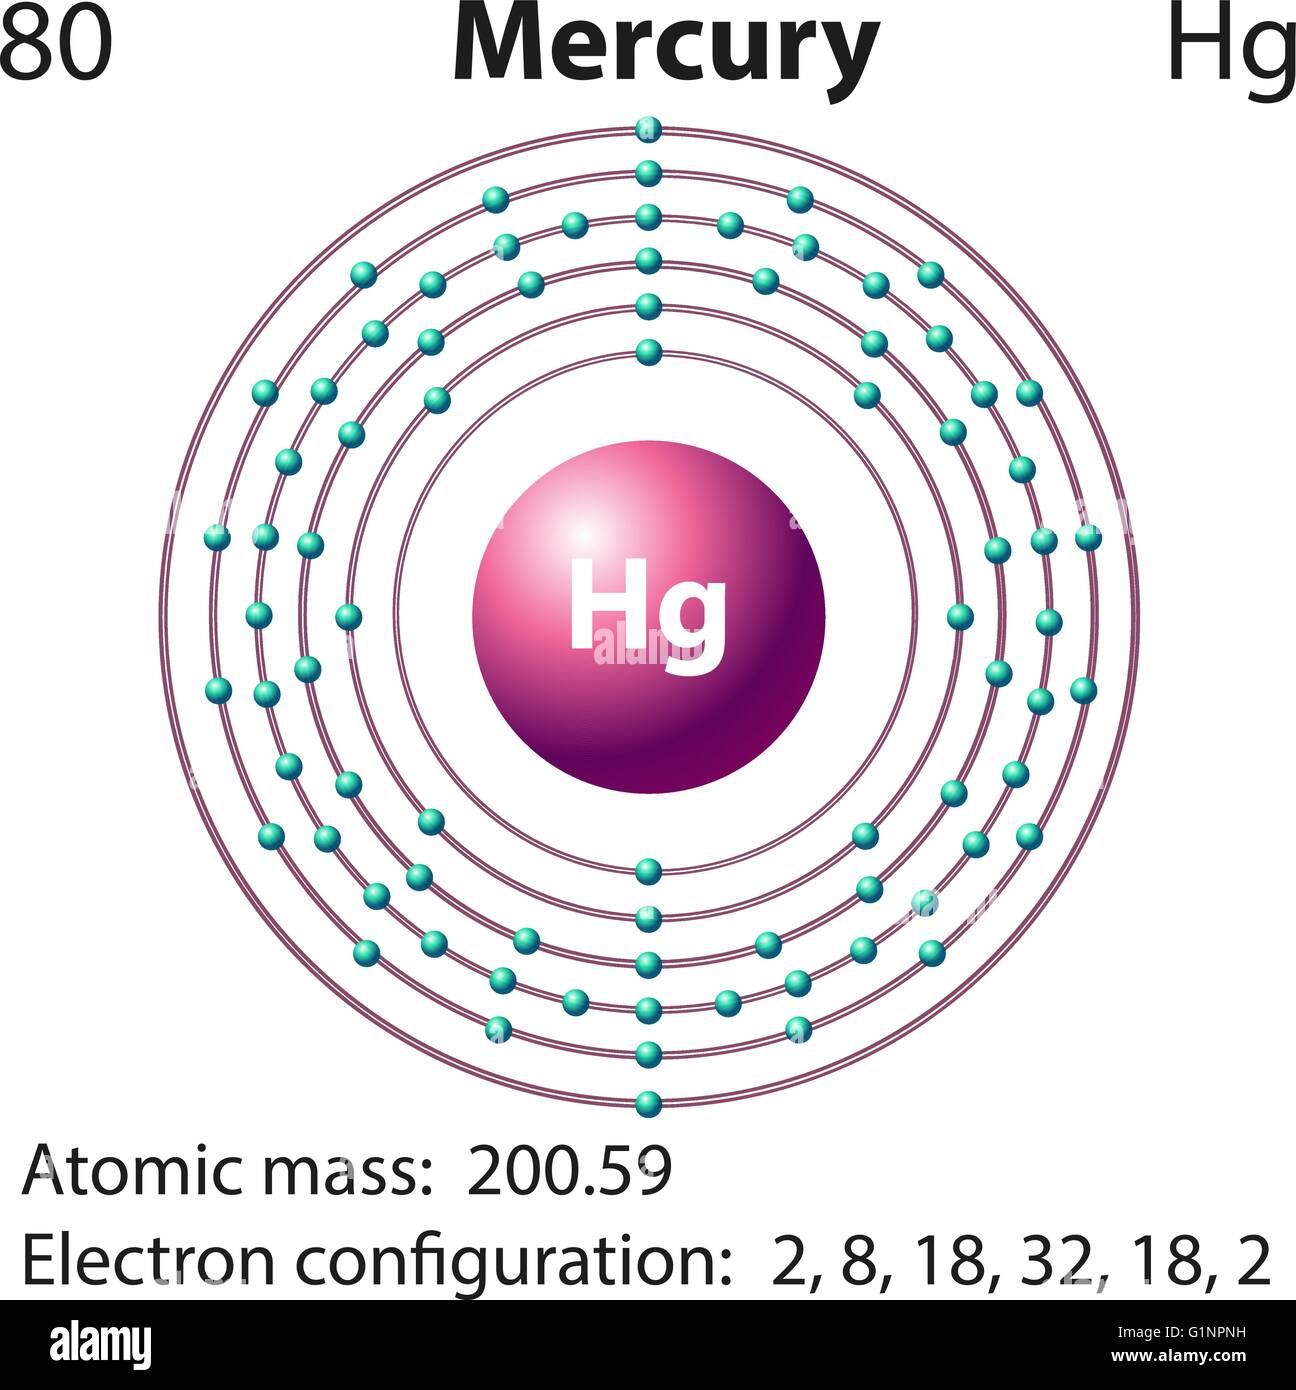 hight resolution of diagram representation of the element mercury illustration stockdiagram representation of the element mercury illustration